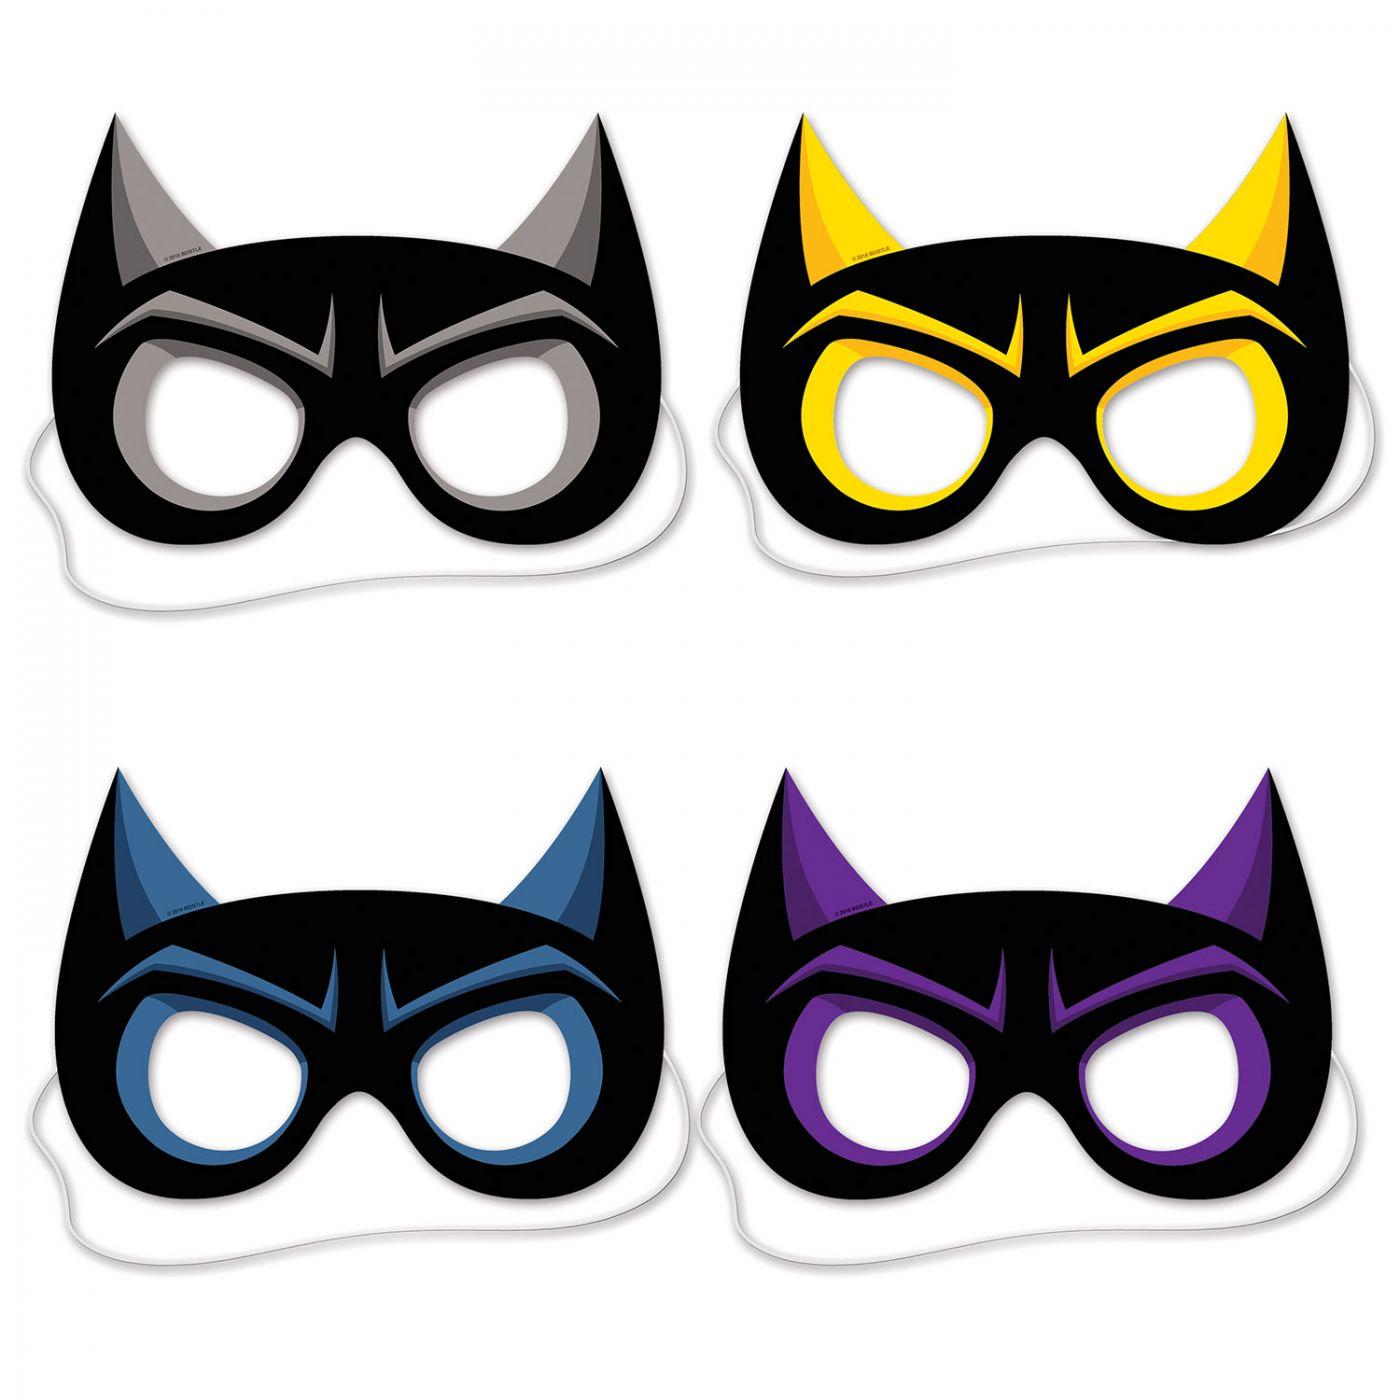 Hero Masks image